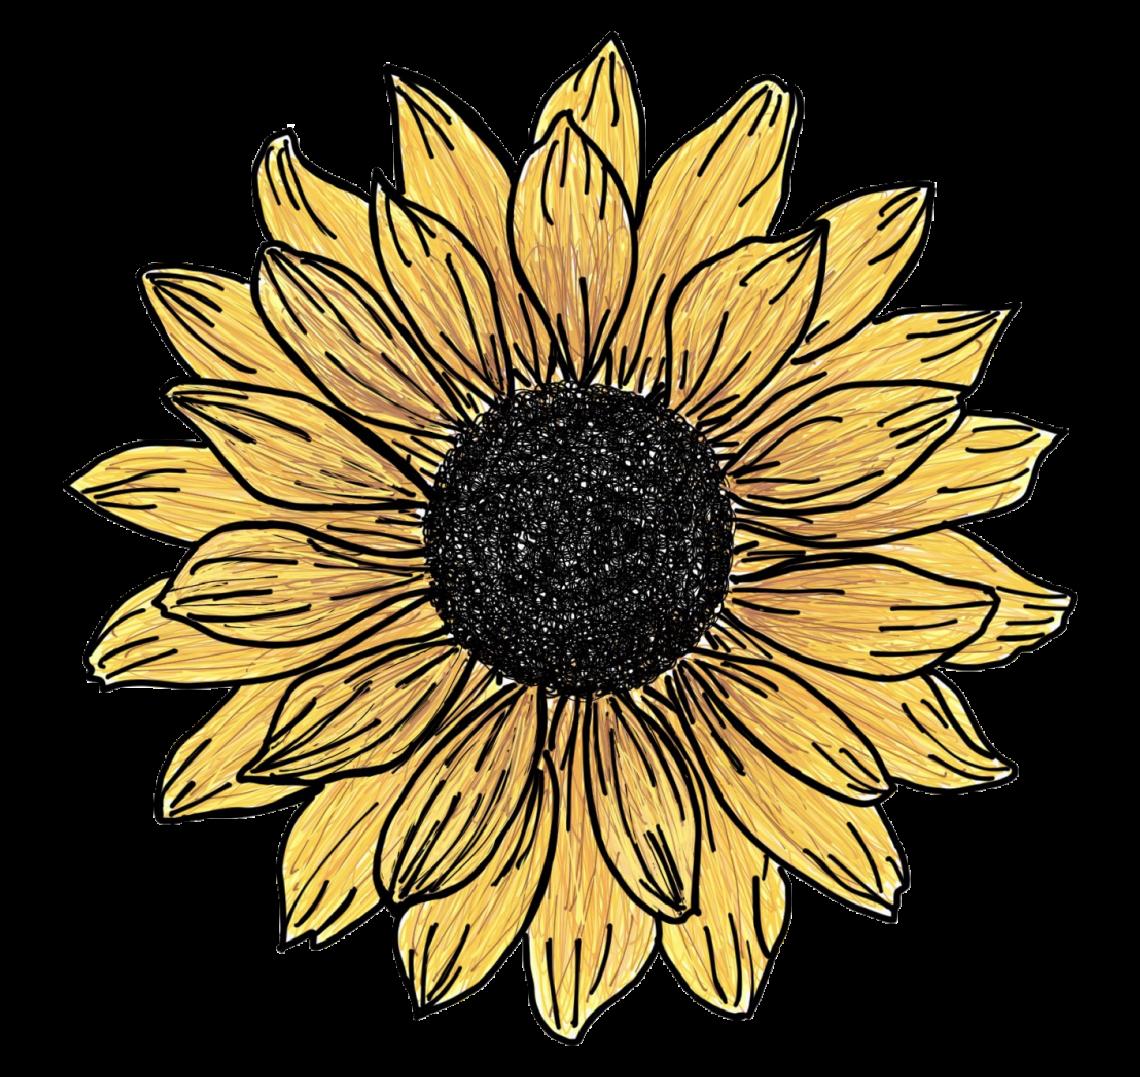 Thesunfloweradventures logo .jpg